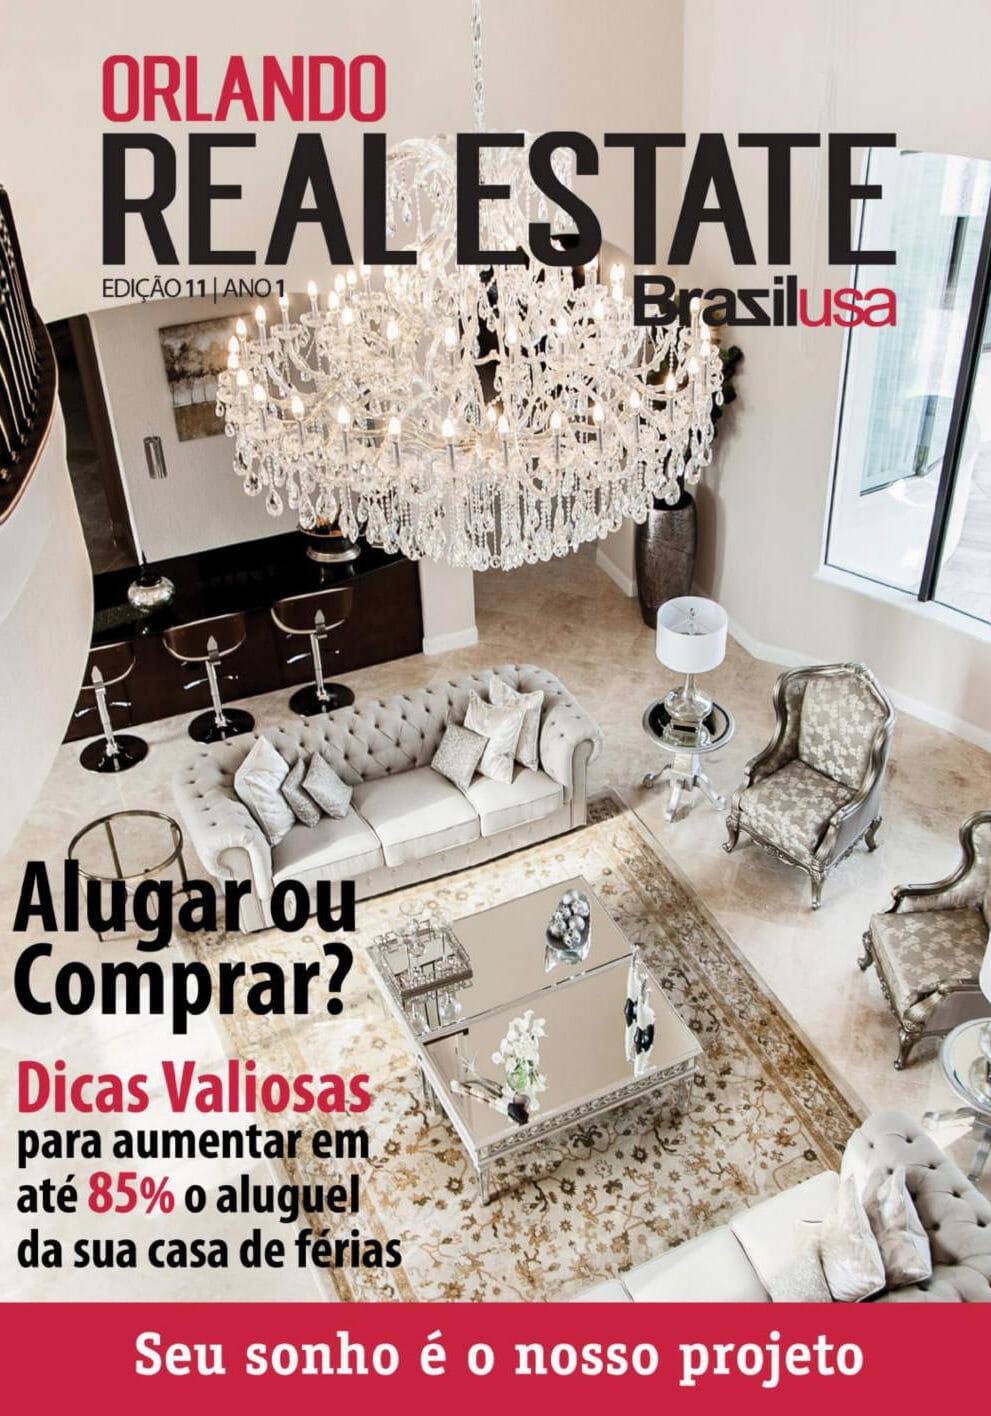 Orlando Real Estate ed 11